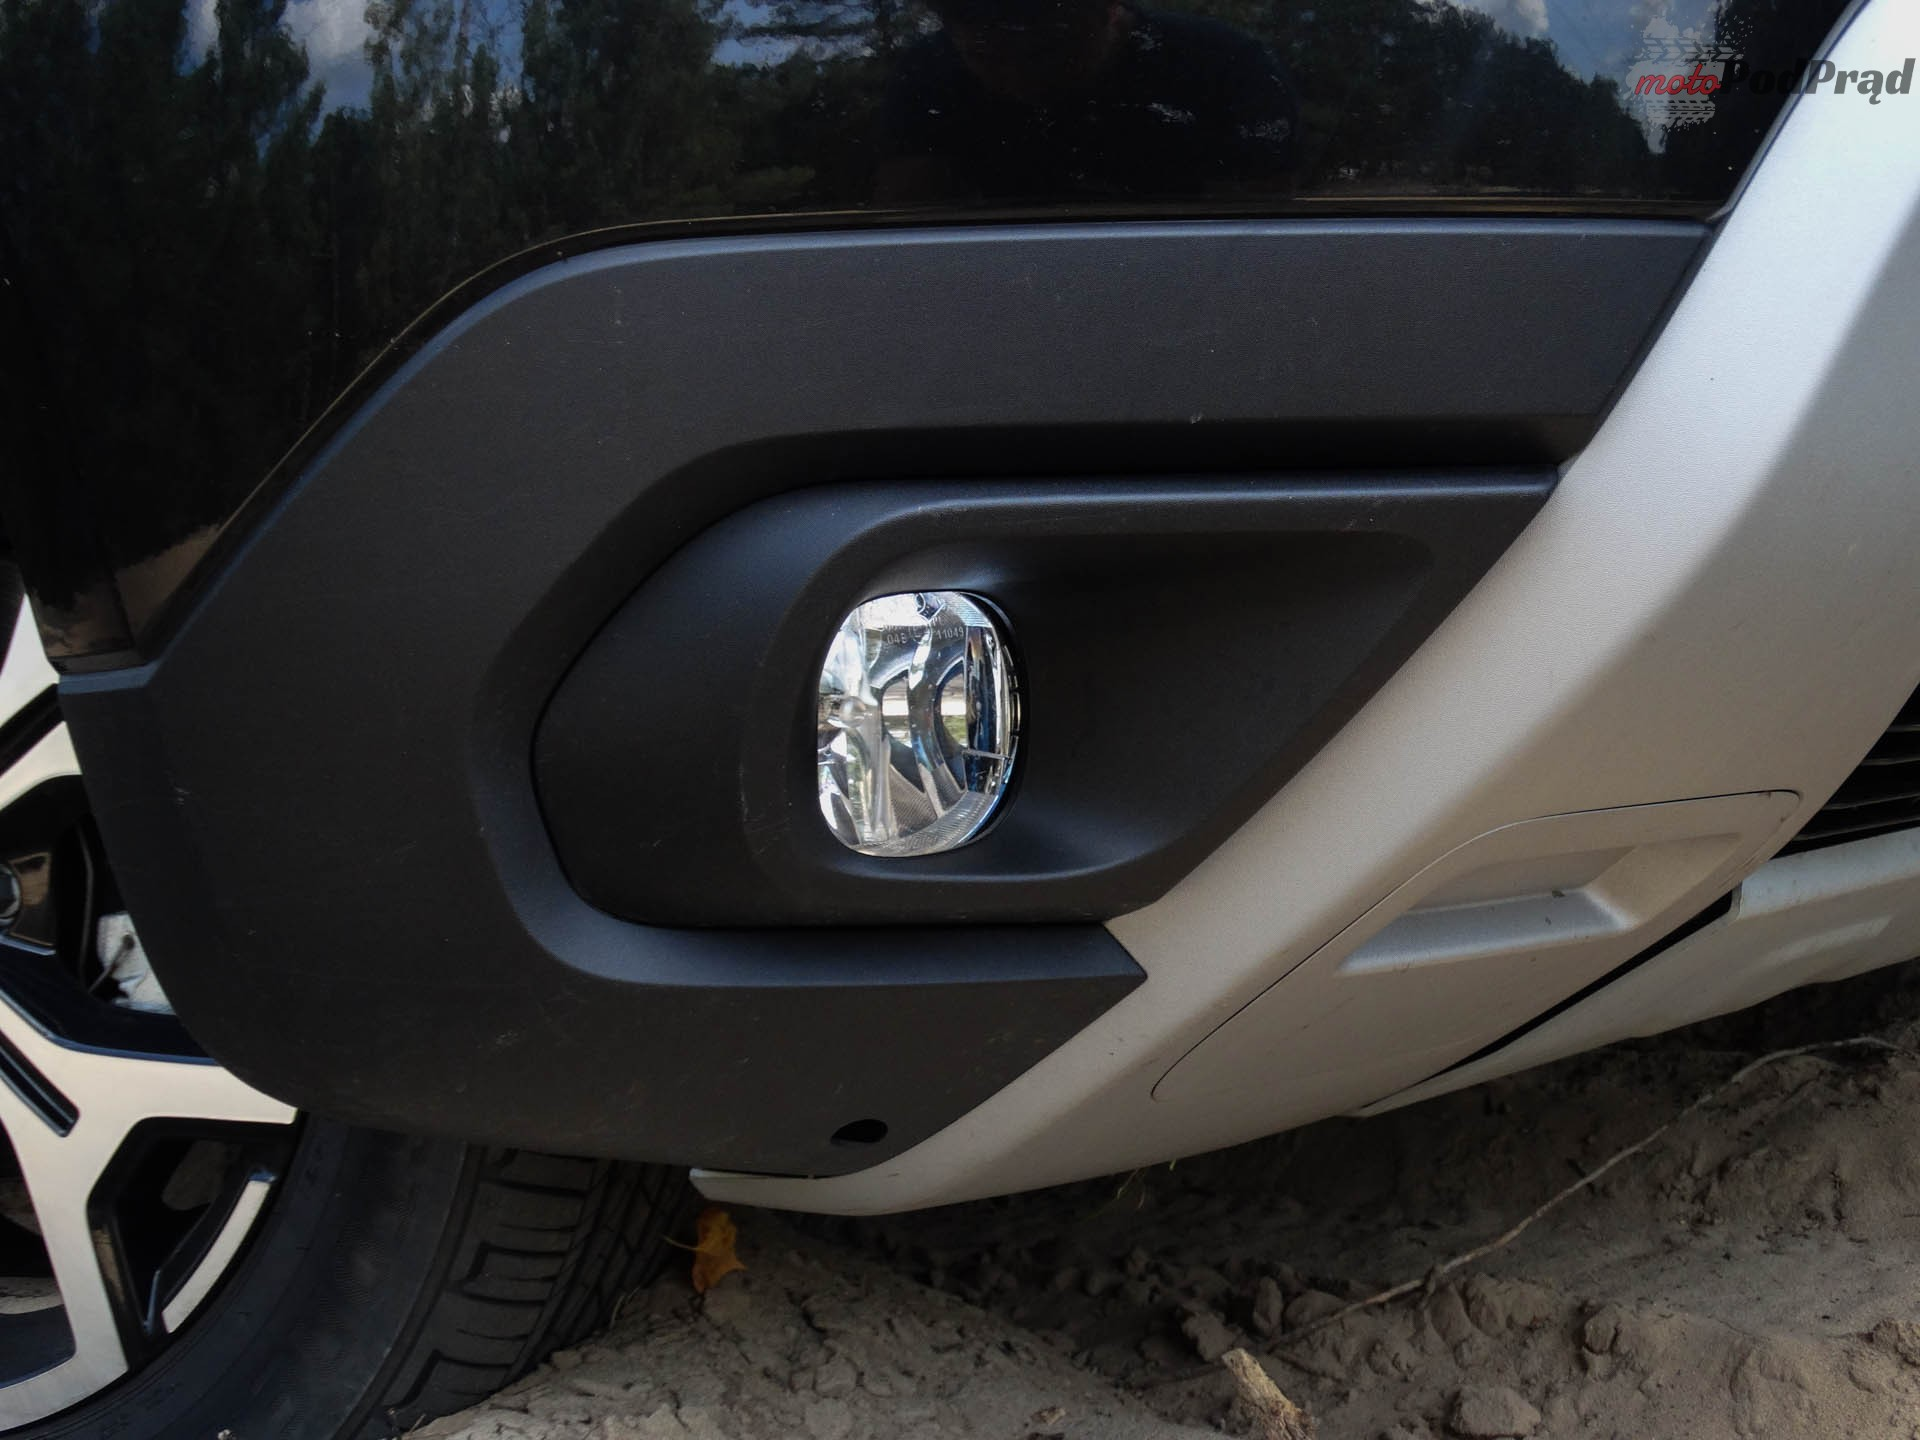 Dacia Duster 6 Test: Dacia Duster PRESTIGE 1.5 dci 4WD – w prostocie siła!